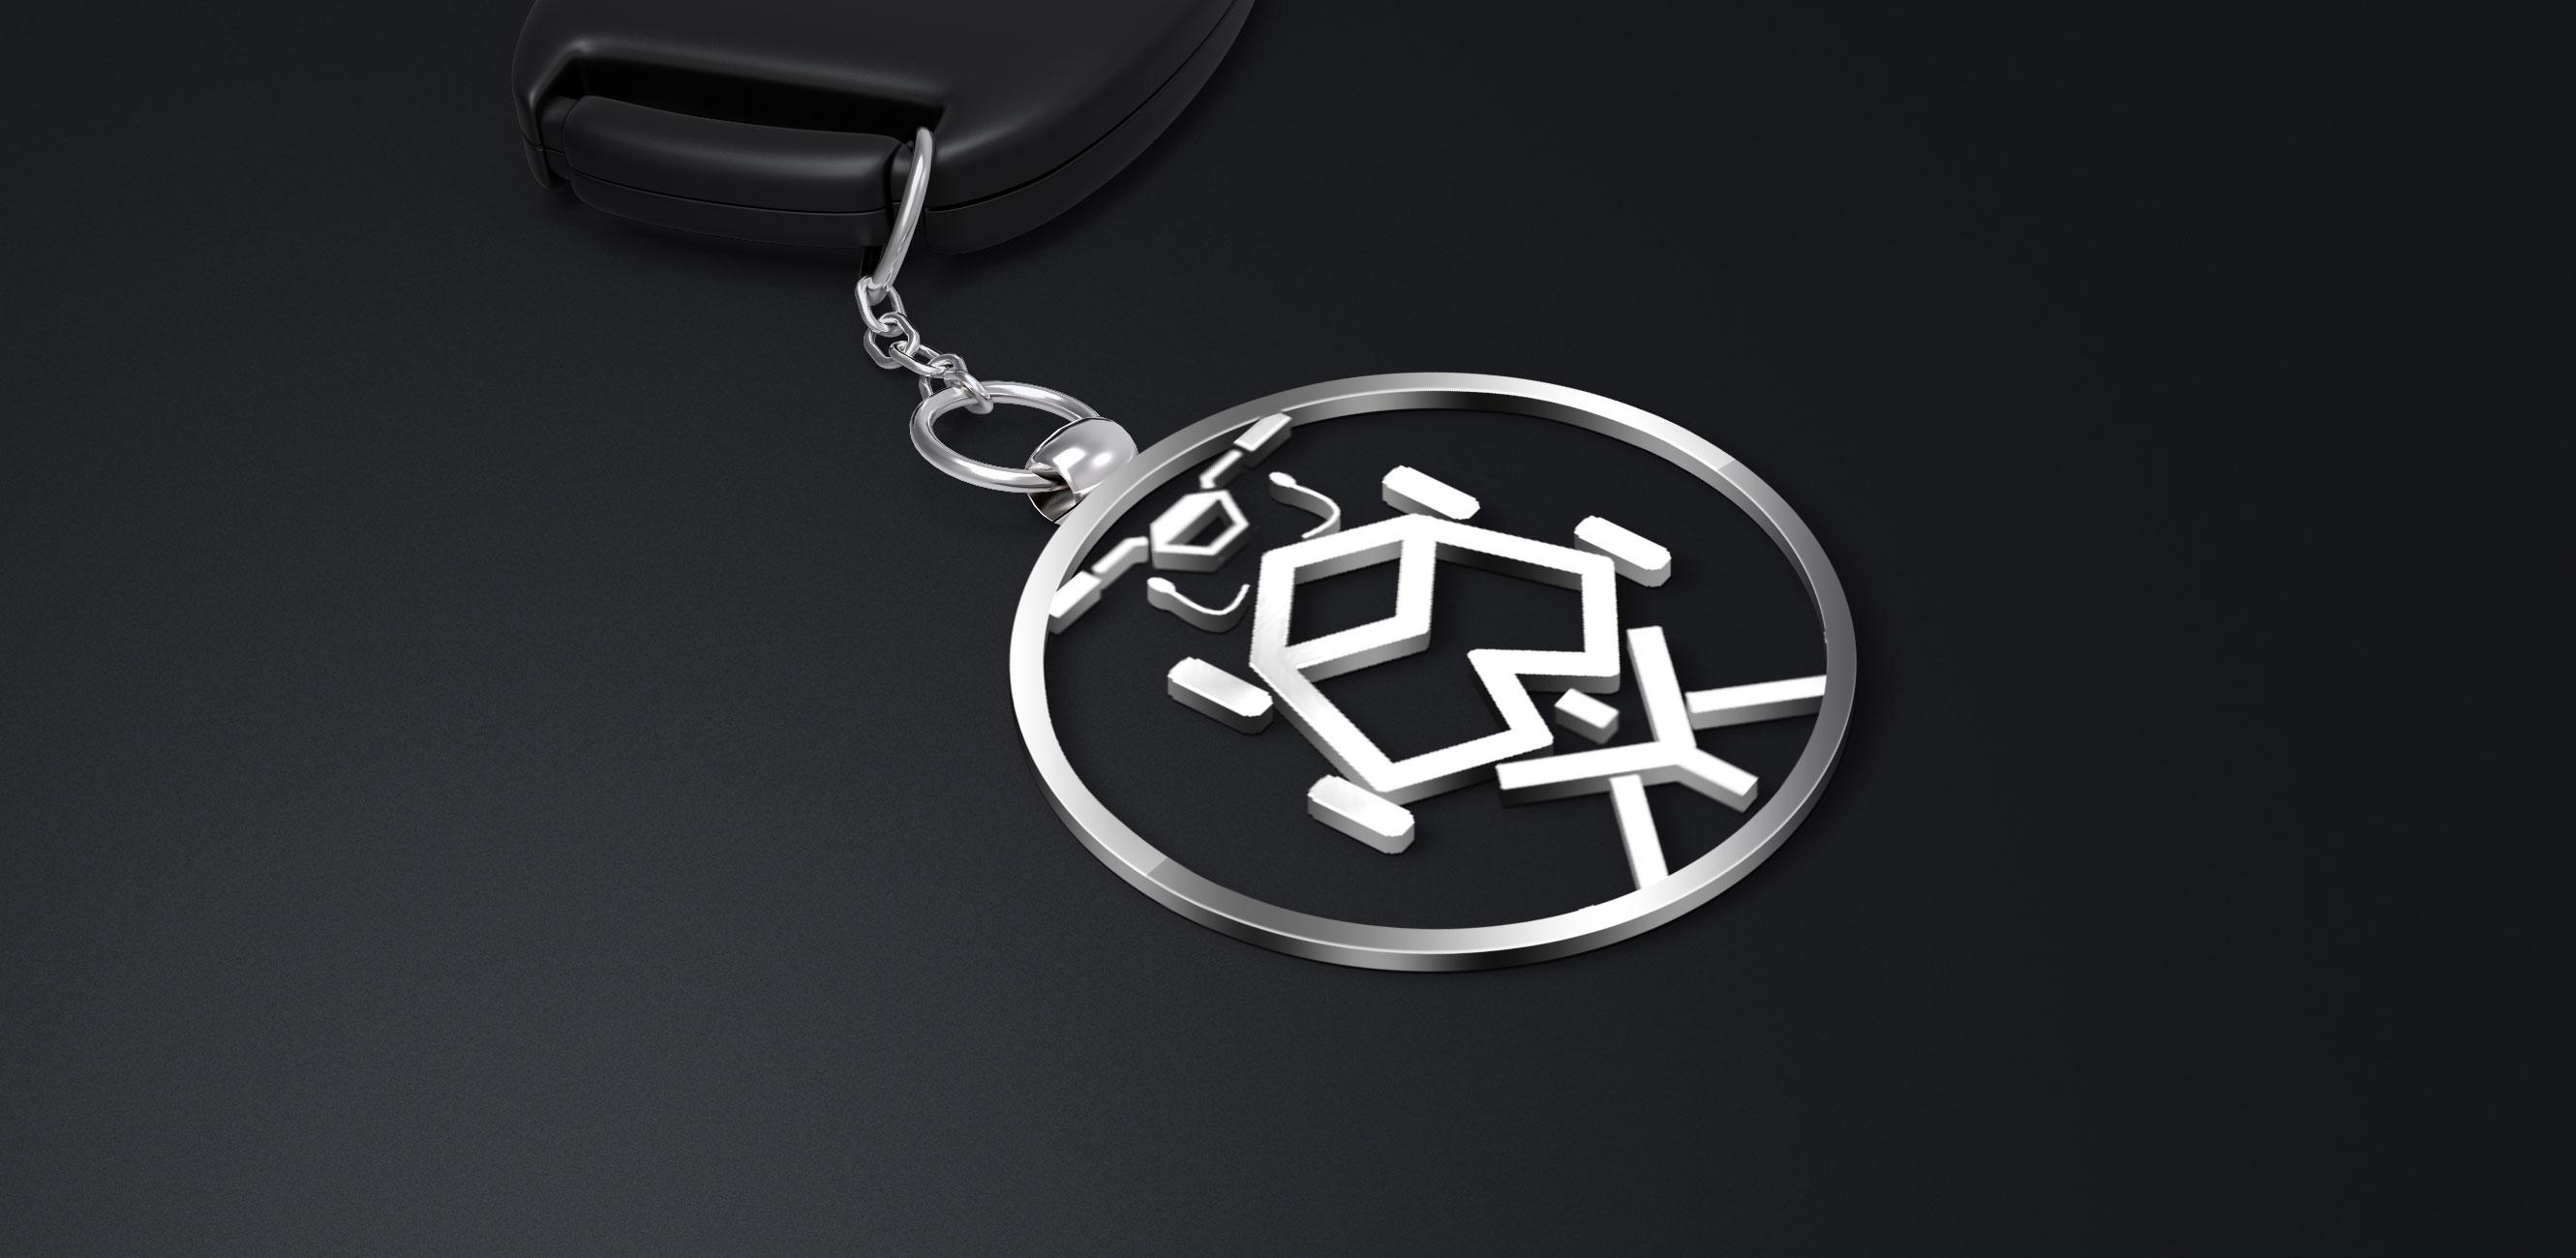 Нужен логотип (эмблема) для самодельного квадроцикла фото f_6055b03dc76adf10.jpg